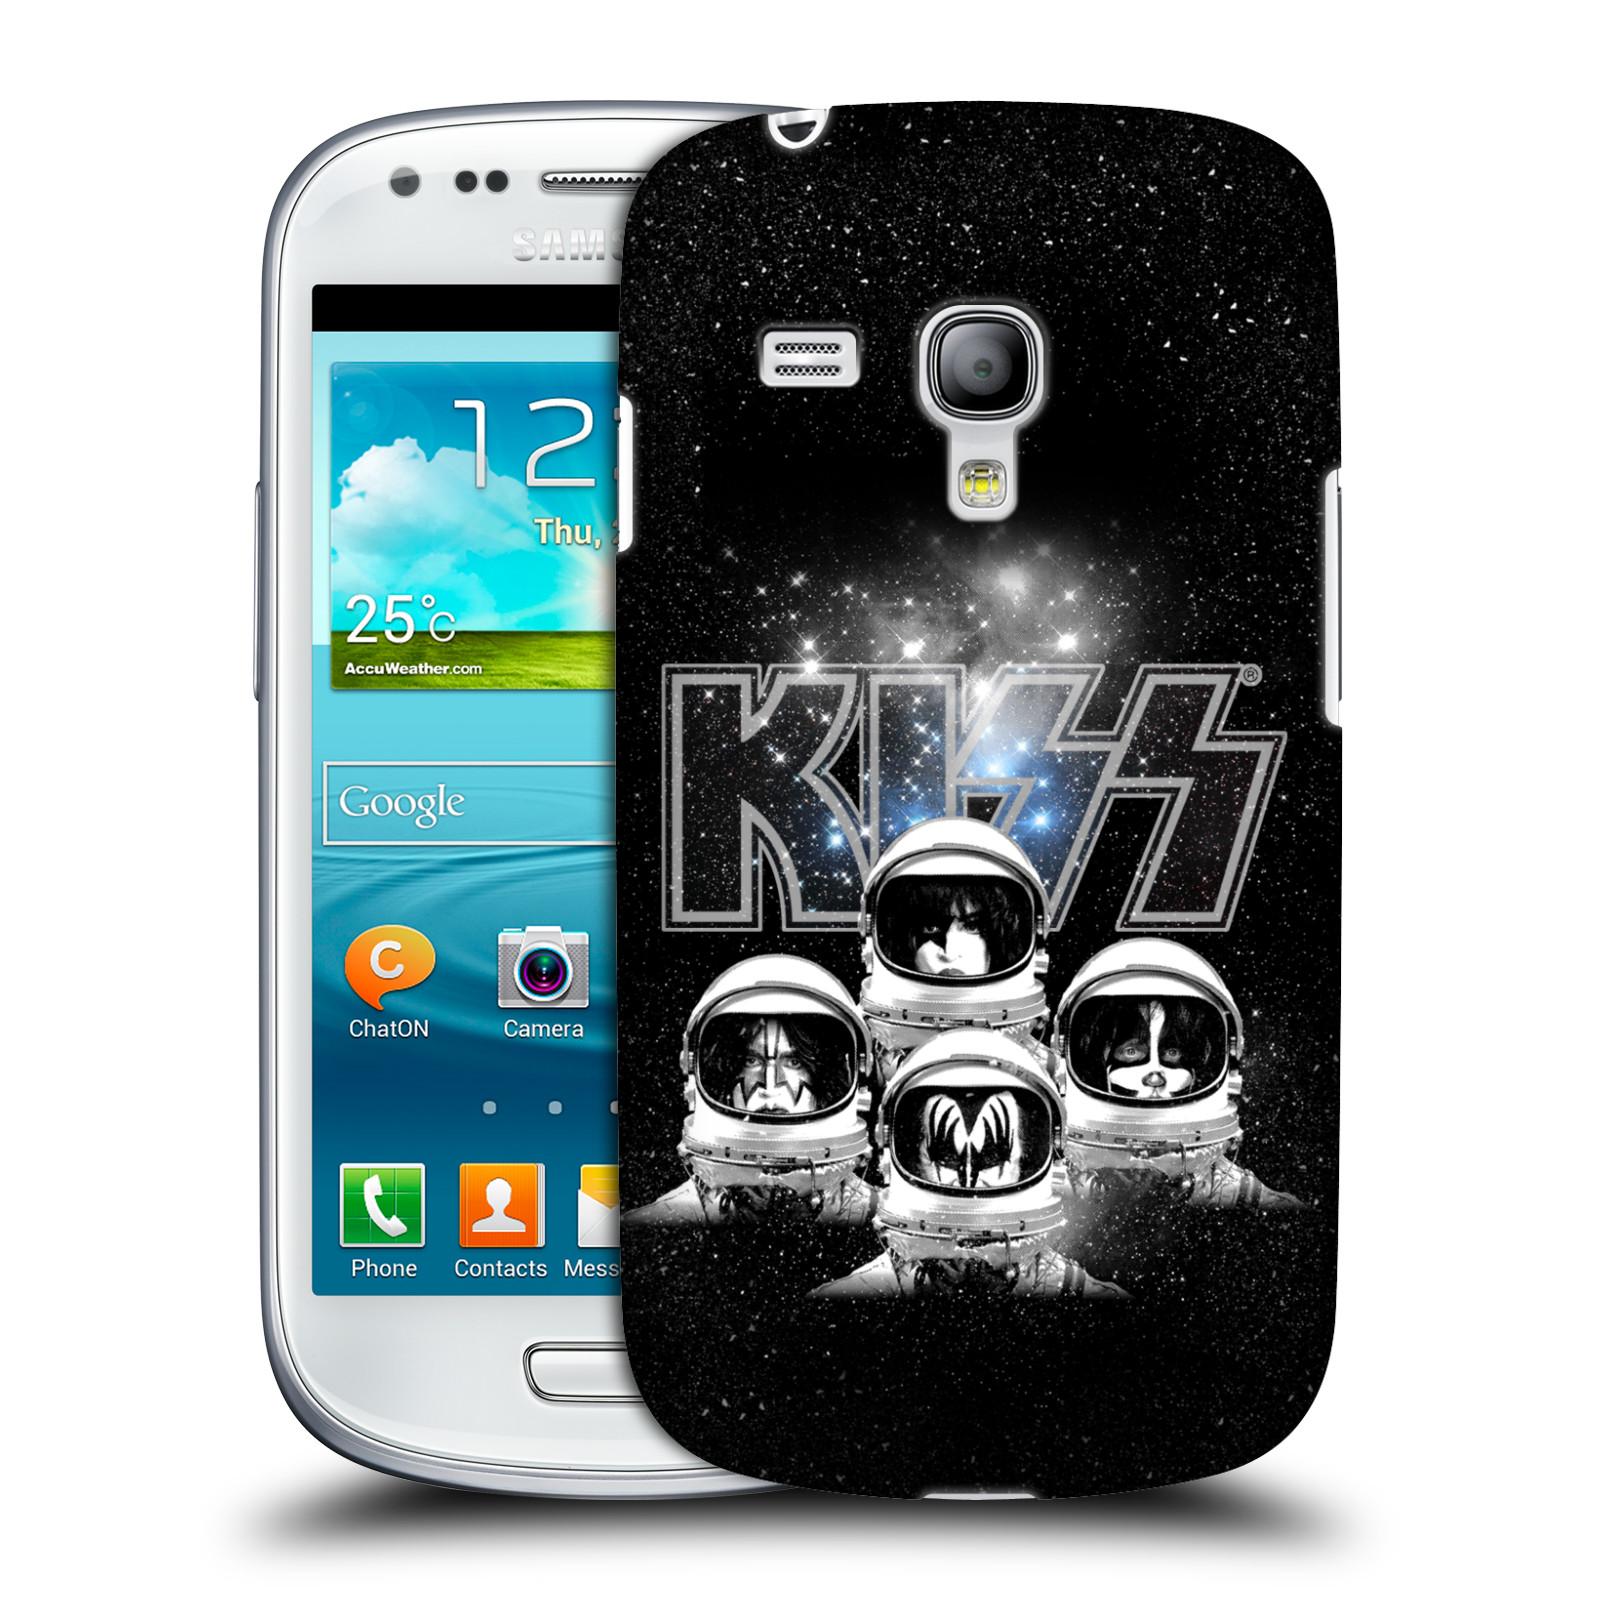 Silikonové pouzdro na mobil Samsung Galaxy S III Mini VE HEAD CASE - Kiss - Galactic (Plastový kryt či obal na mobilní telefon s licencovaným motivem Kiss pro Samsung Galaxy S3 Mini VE GT-i8200)